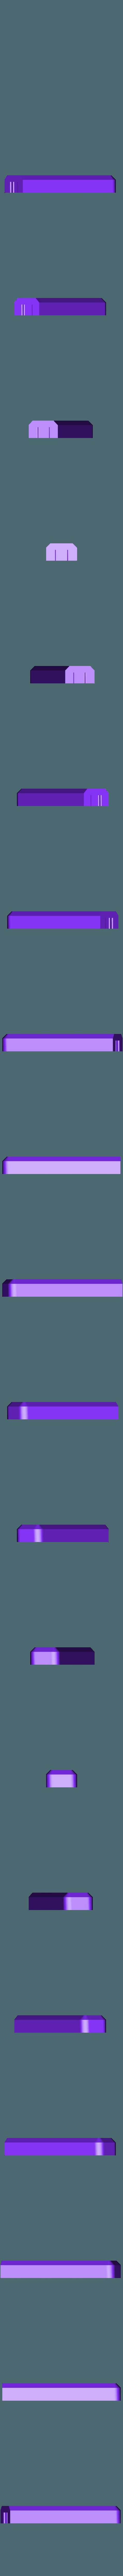 Base-right, Avengers Logo.STL Download free STL file Avengers Rotating Logo • 3D printing template, potentprintables